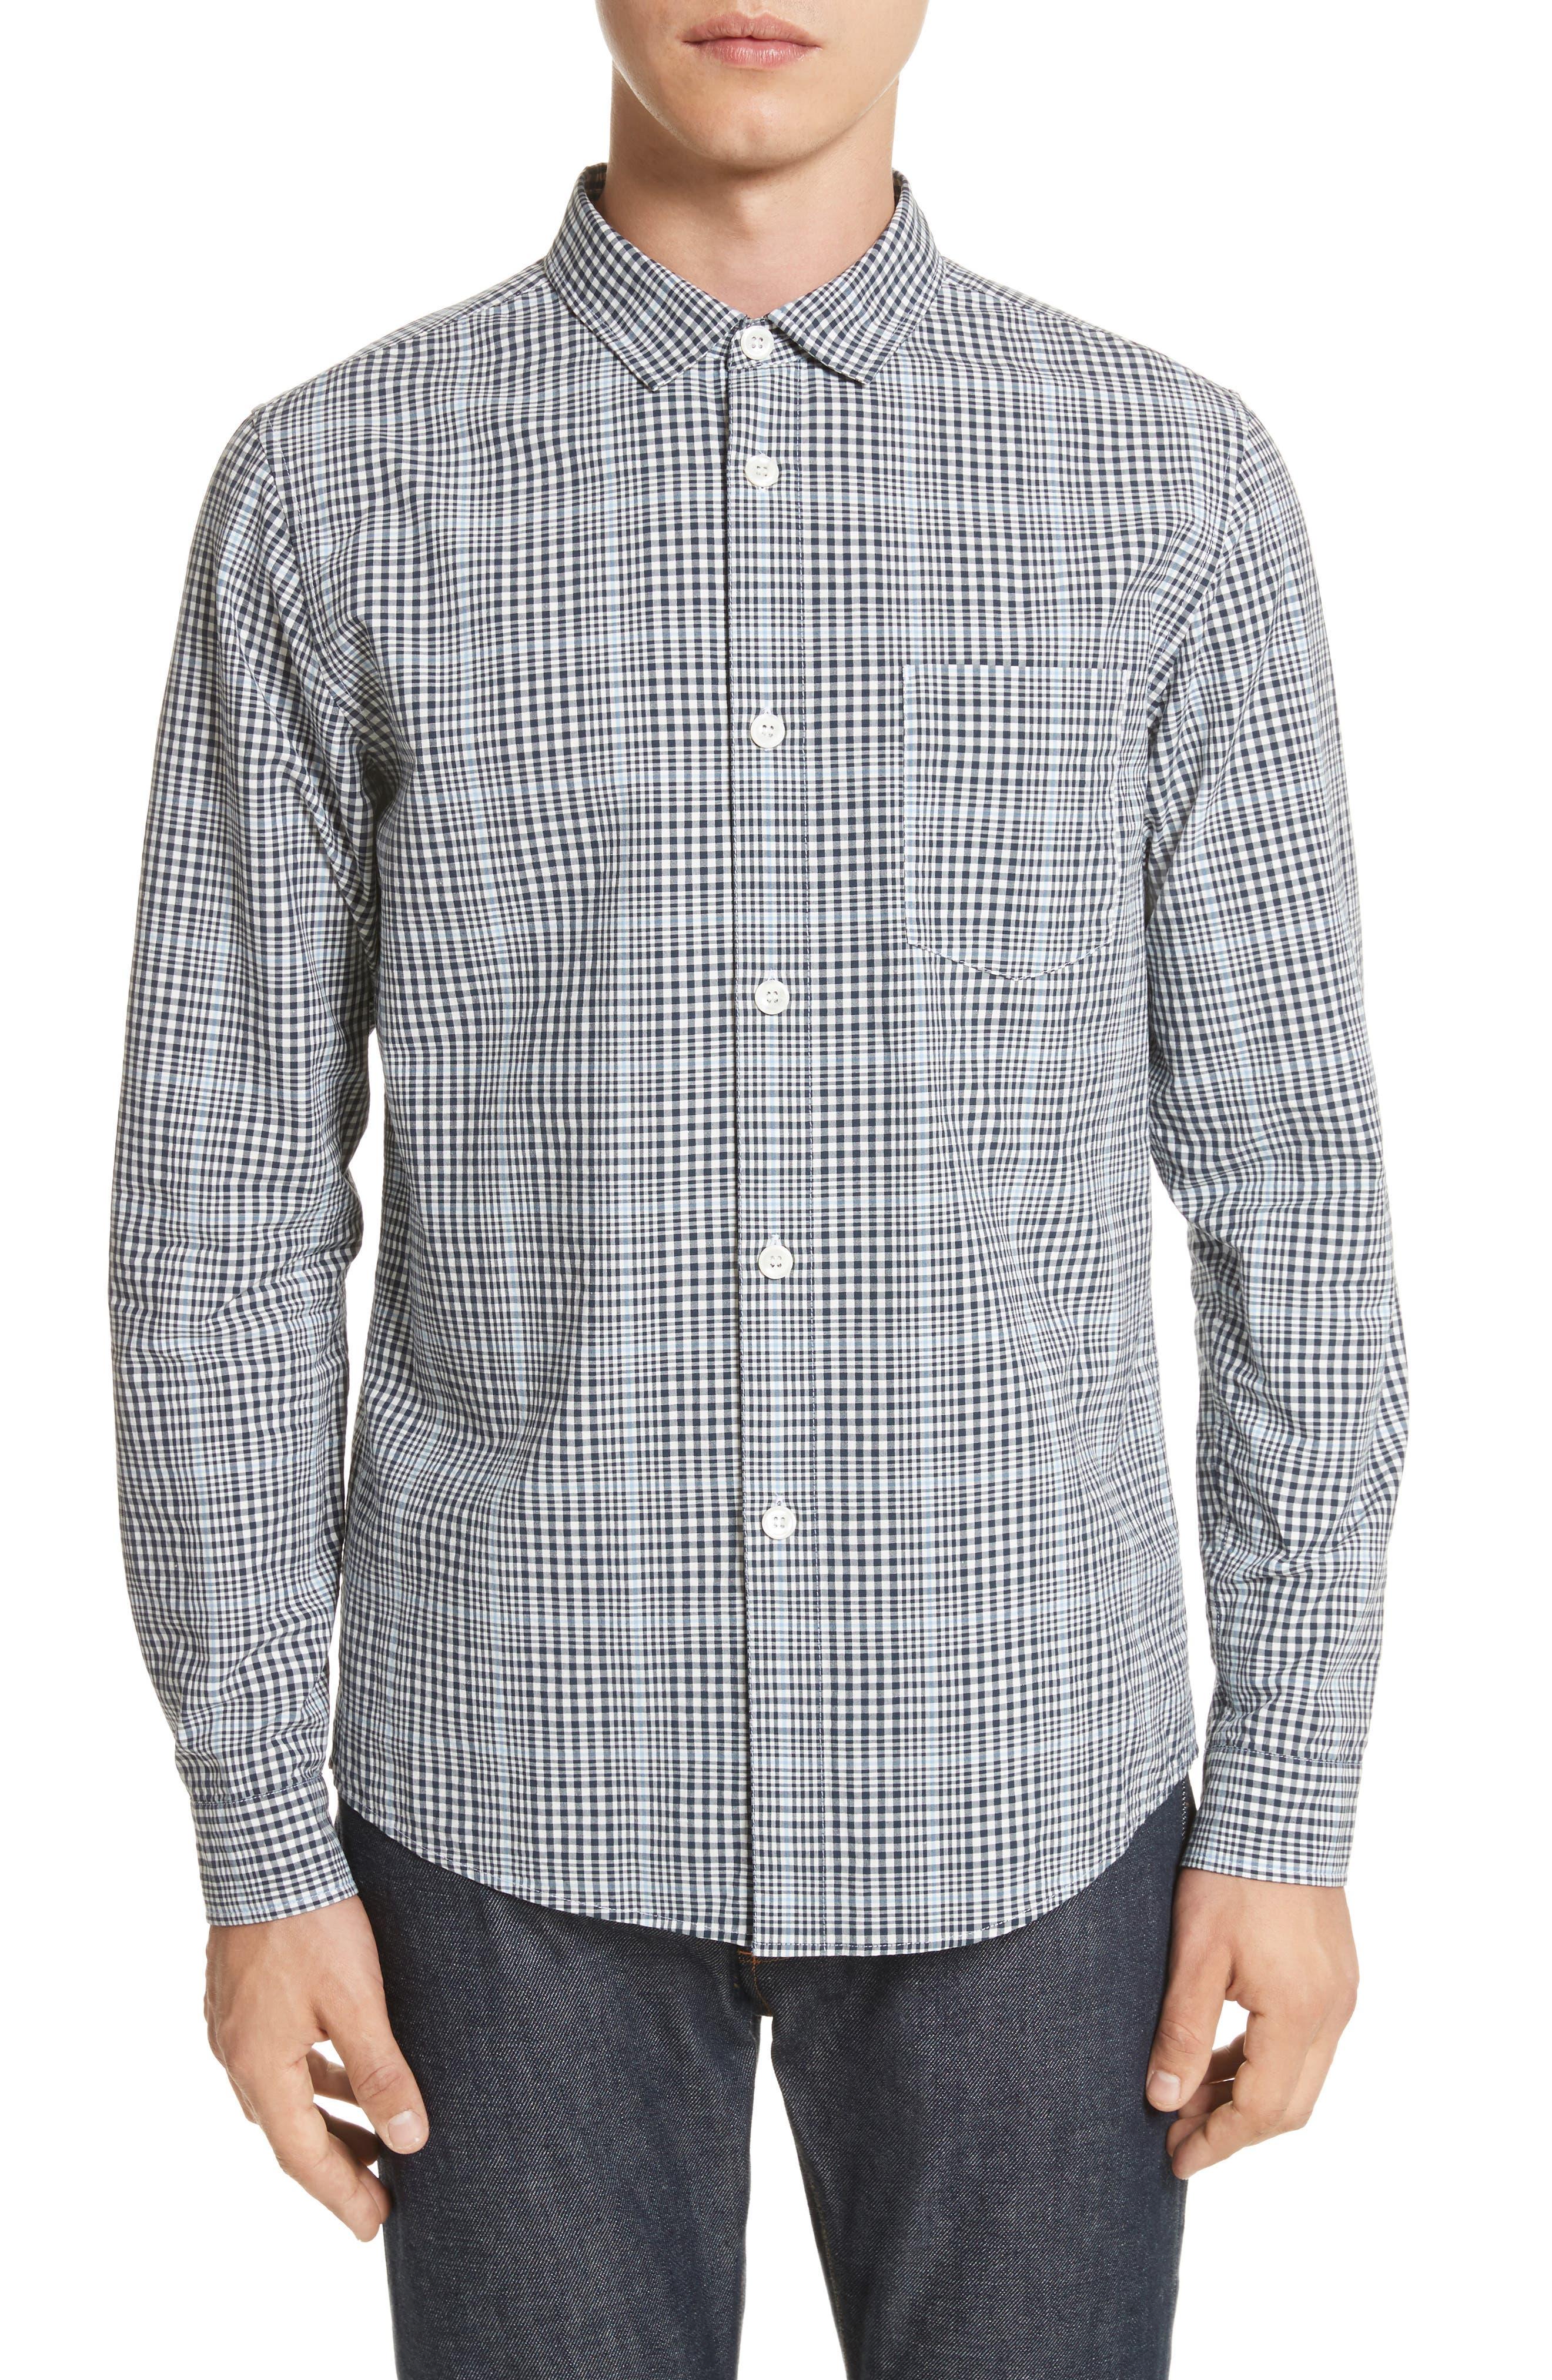 Alternate Image 1 Selected - A.P.C. John Check Woven Shirt